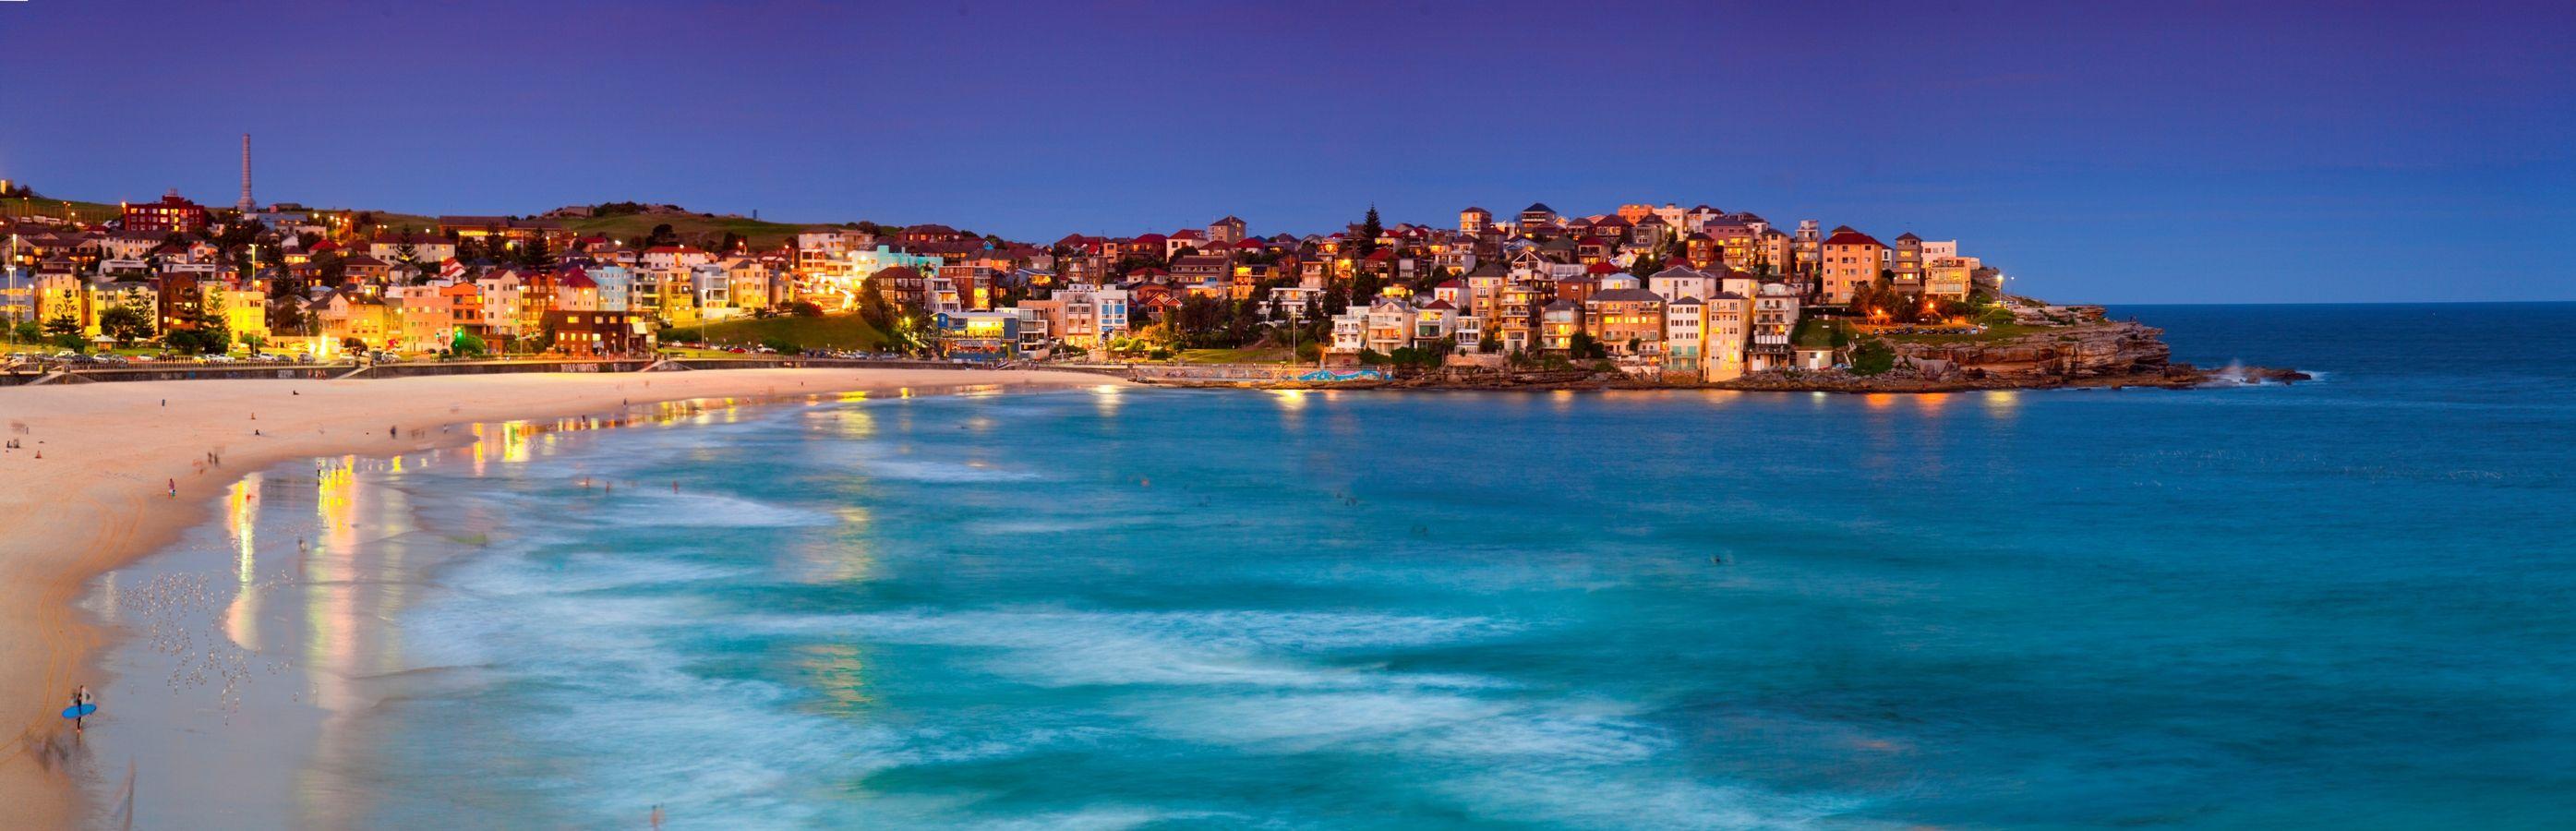 Bondi Beach Australia Places To See Pinterest Sydney